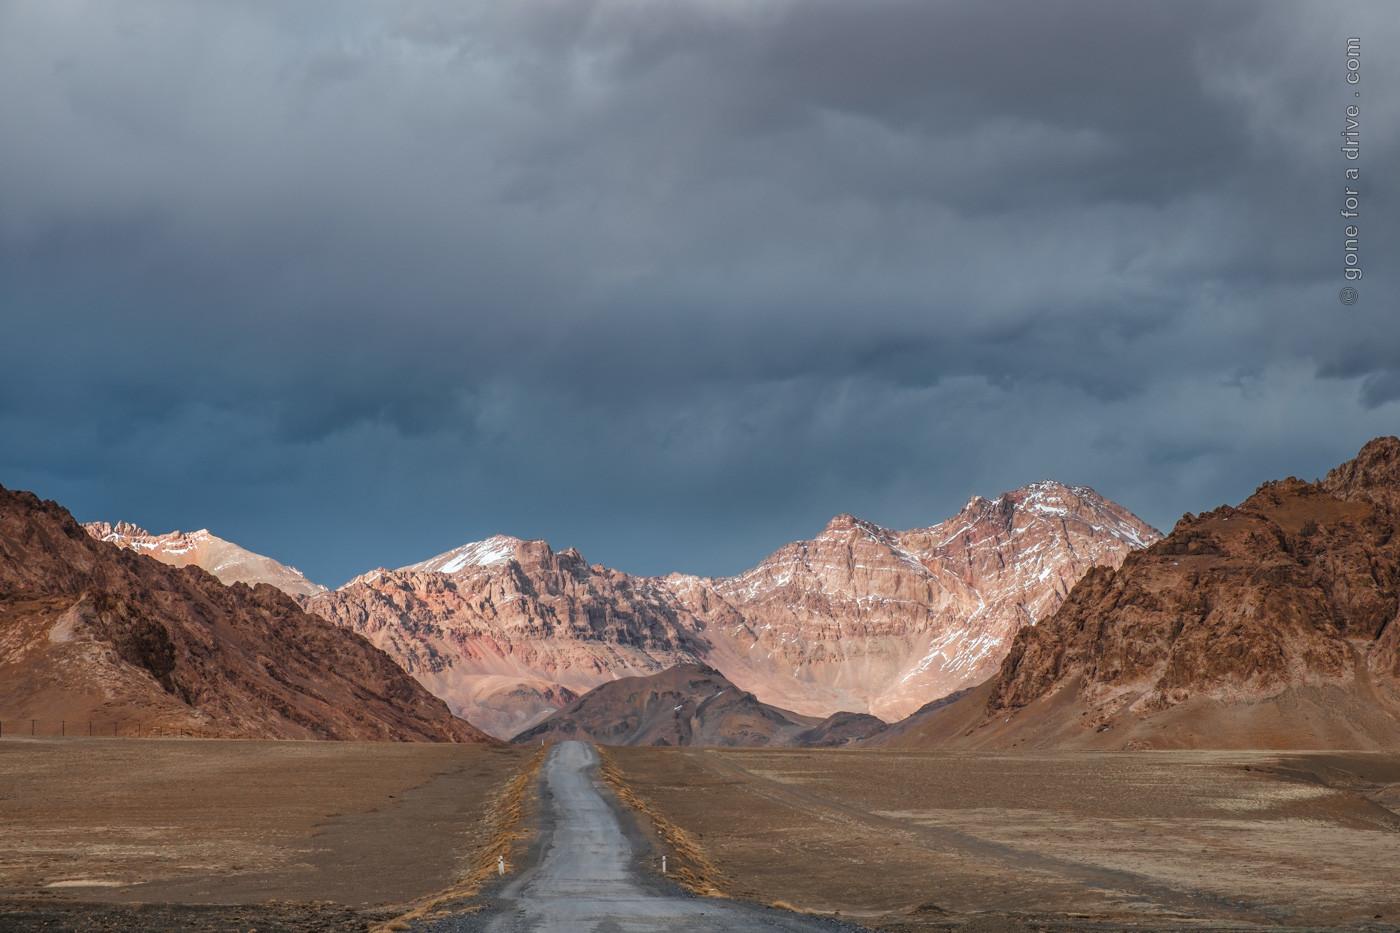 Streckenabschnitt des Pamir Highway, Tadschikistan, kurz hinter Murghab.